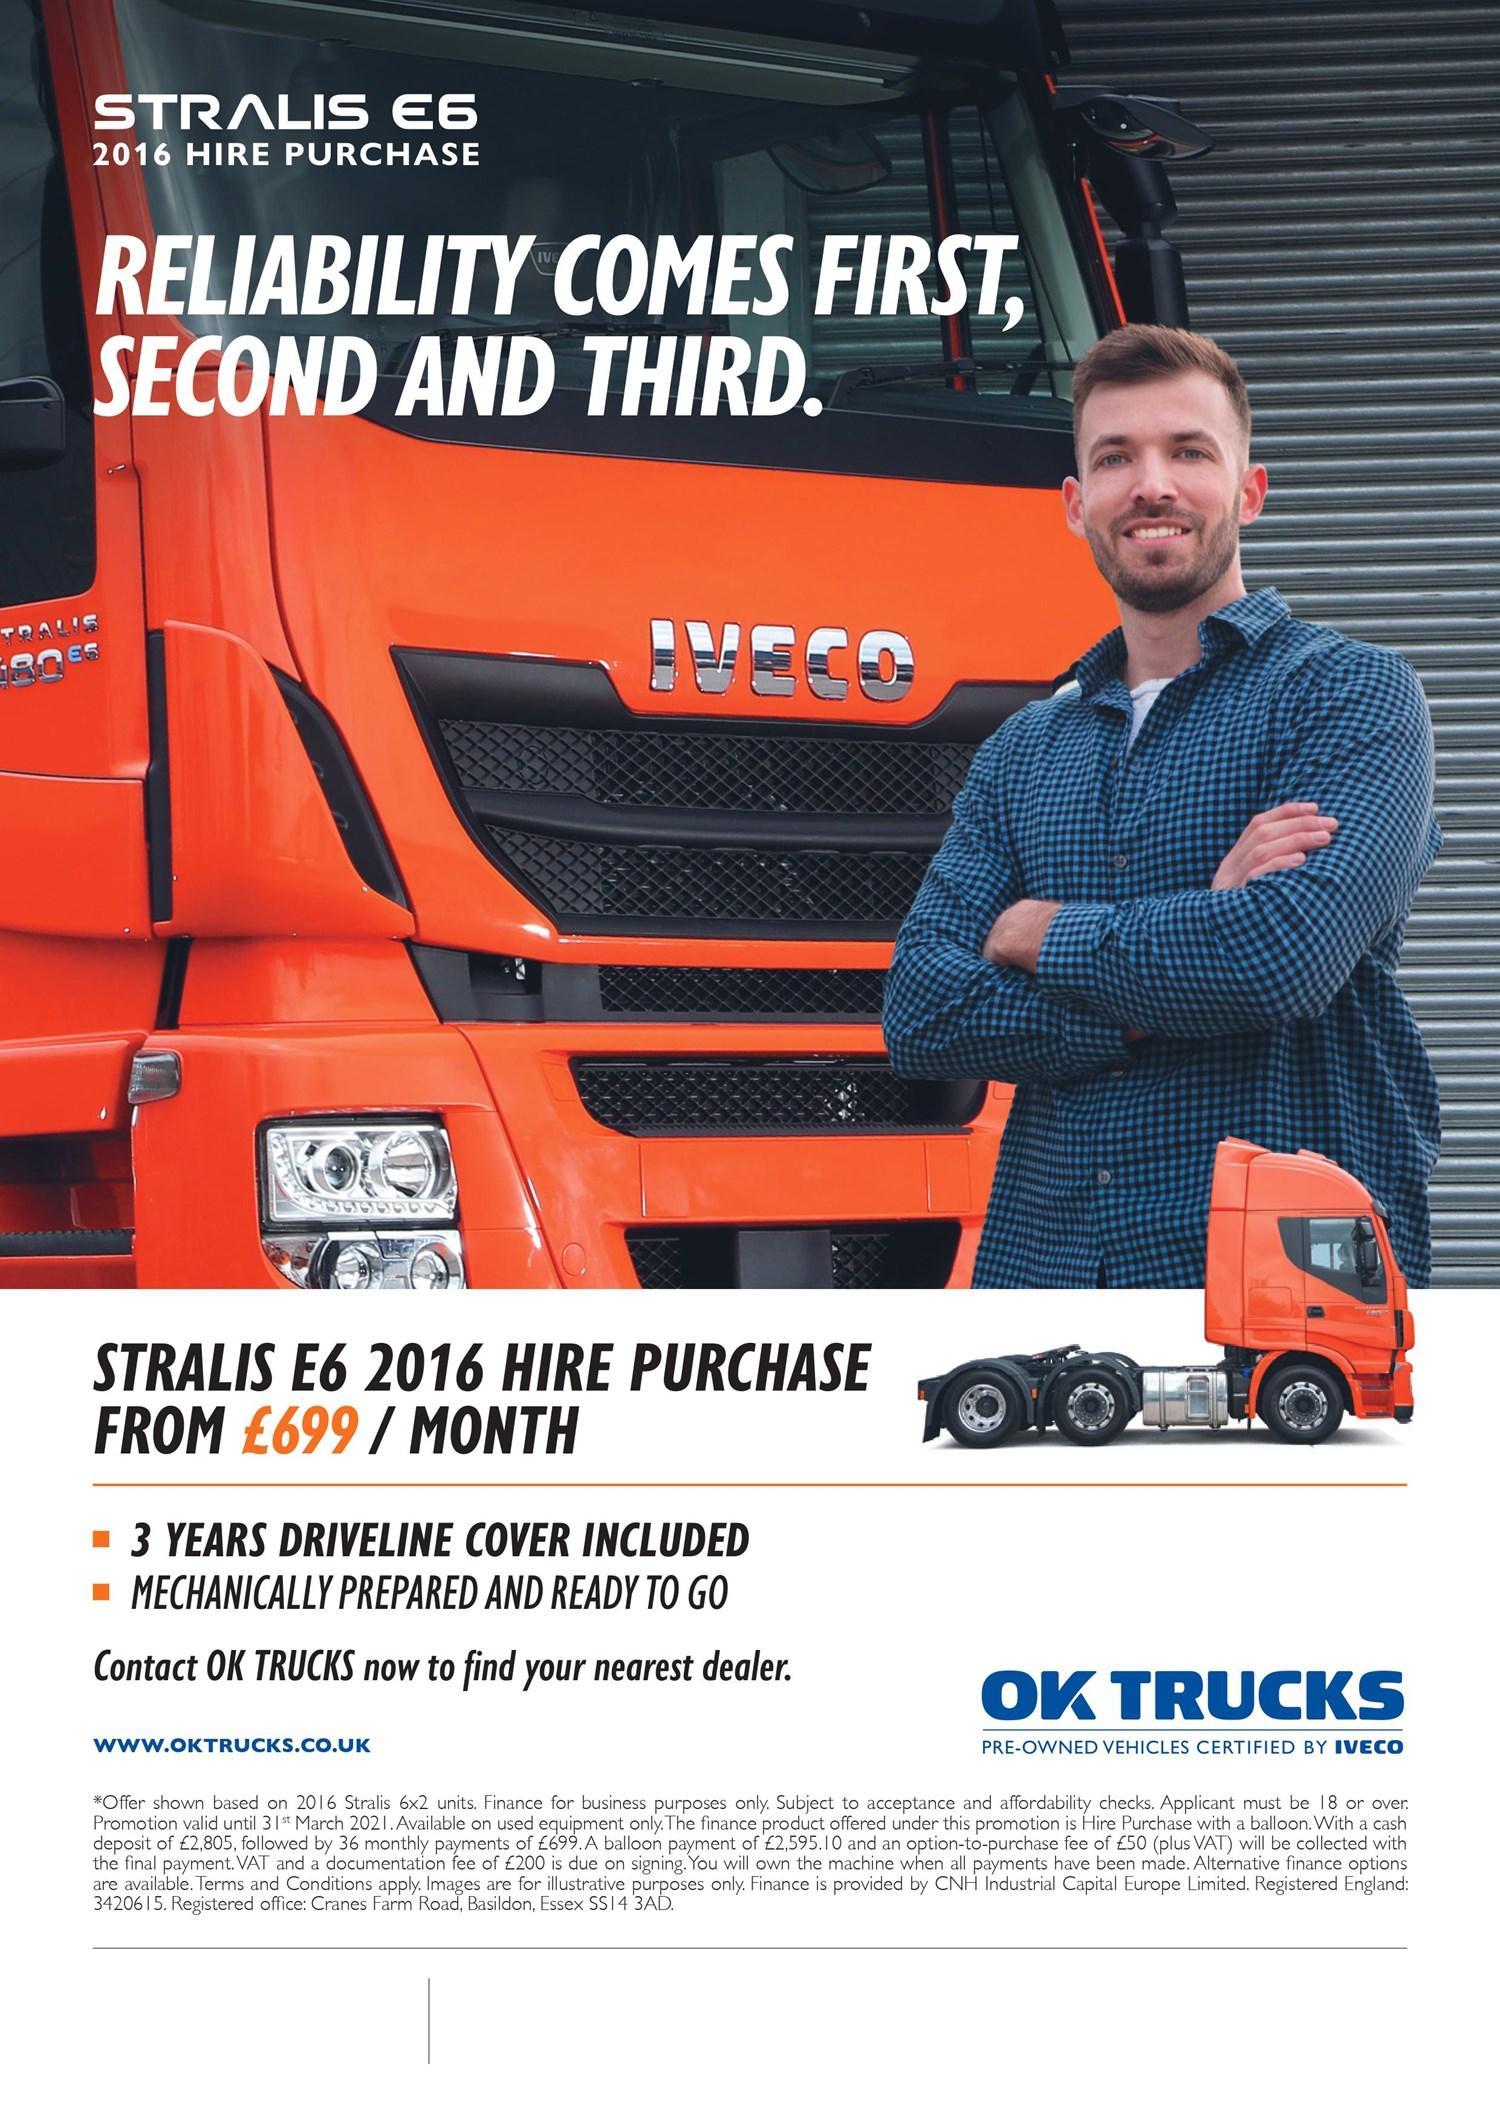 OK Trucks £699 Hire Purchase